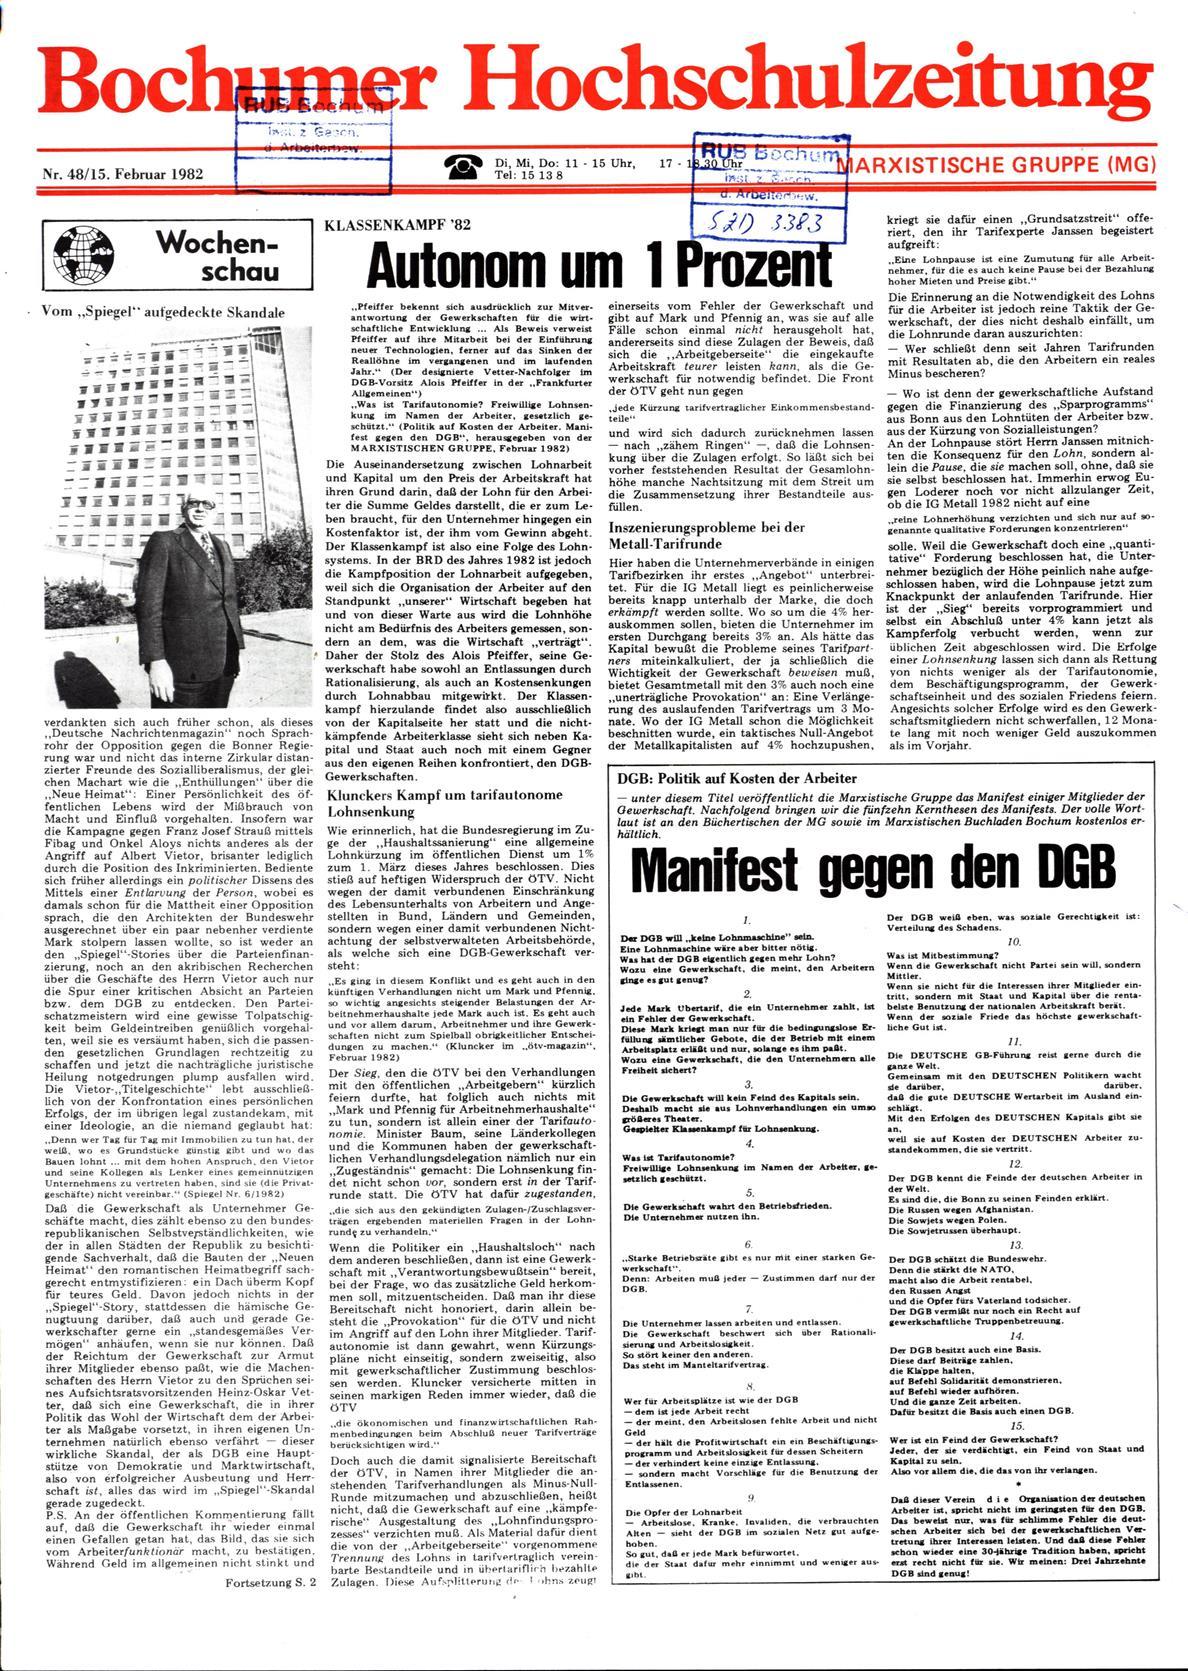 Bochum_BHZ_19820215_048_001